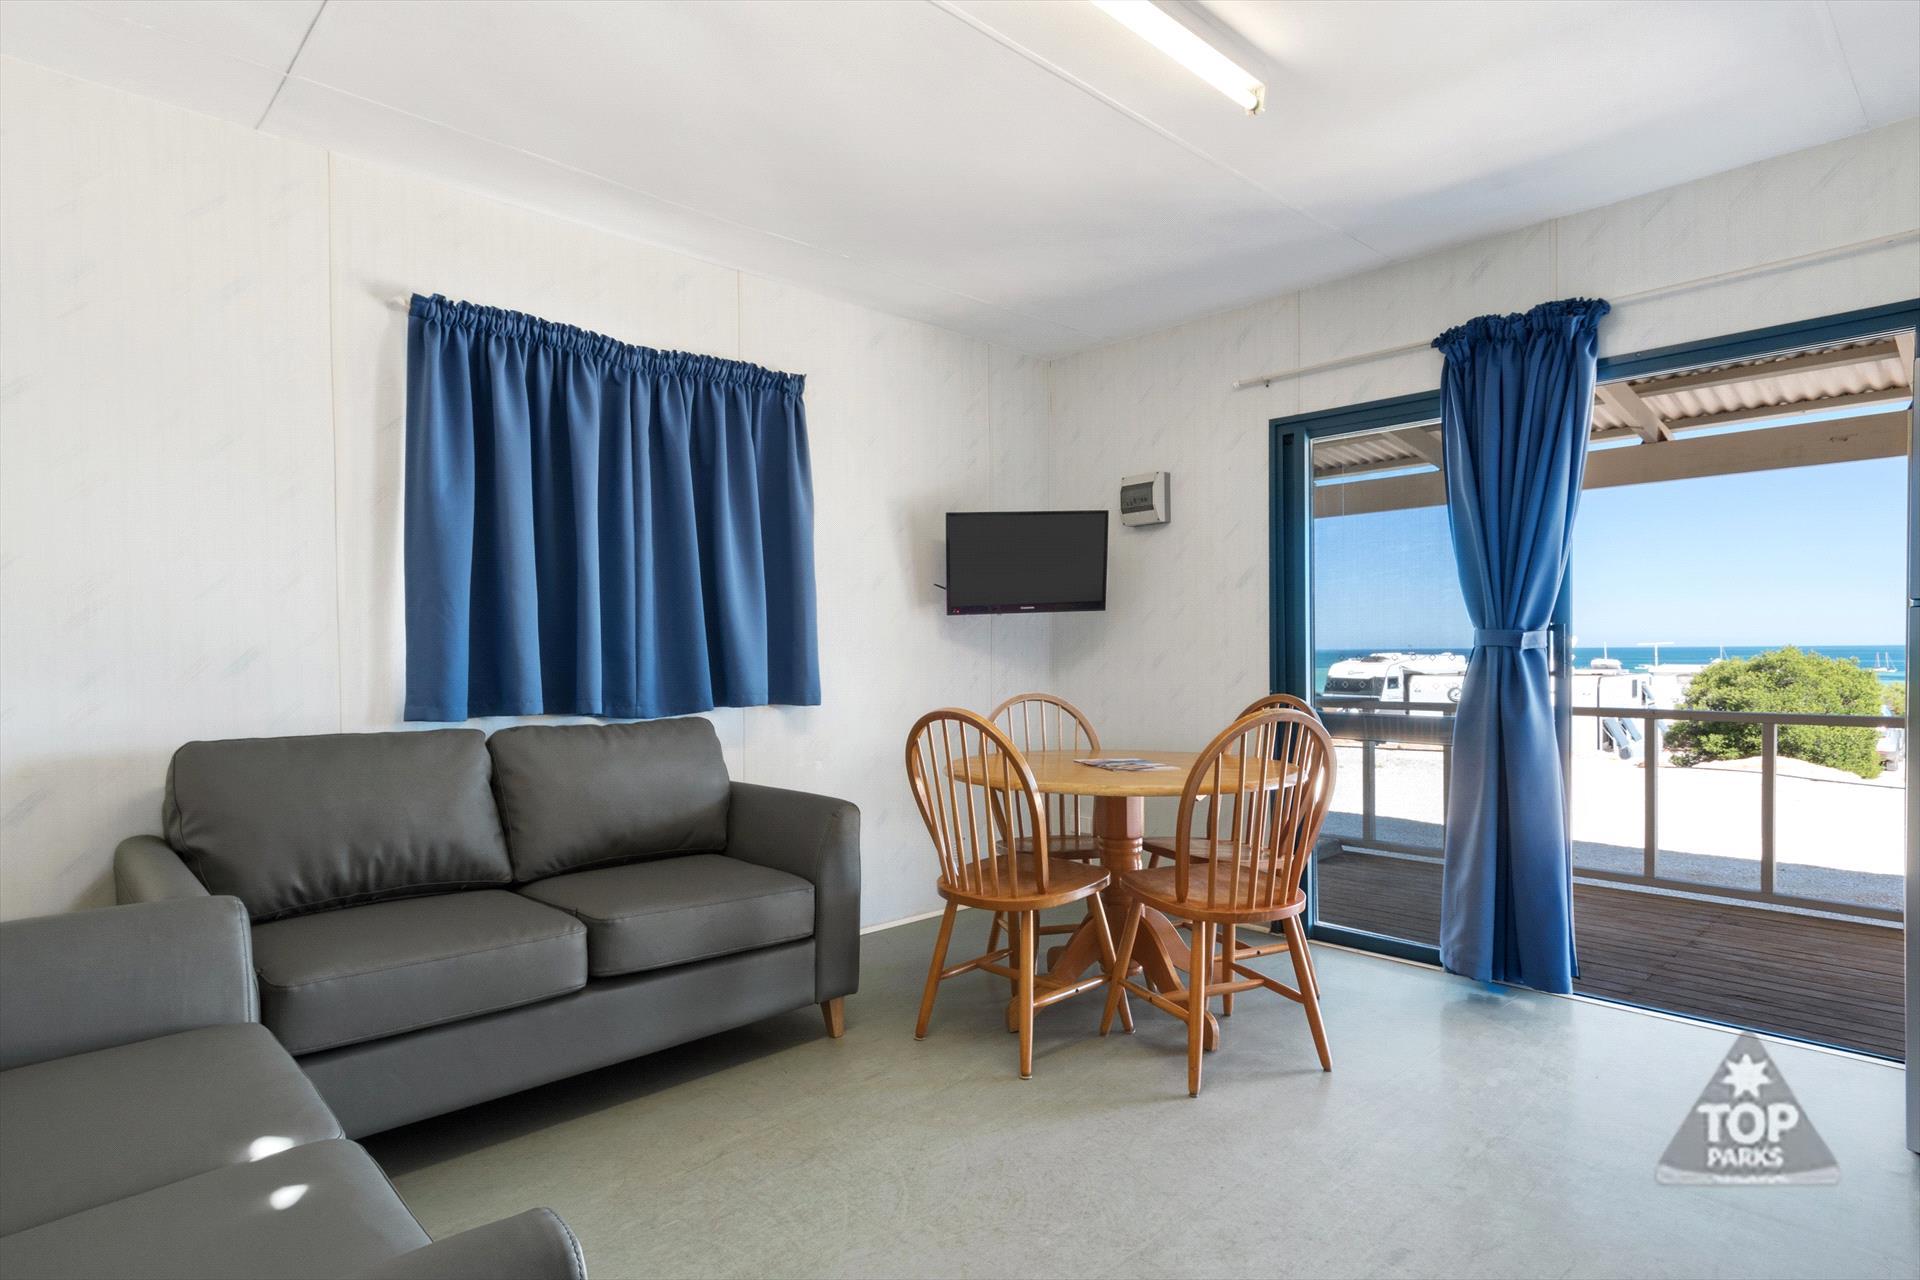 Western Australian Visitor Information Centre - Denham